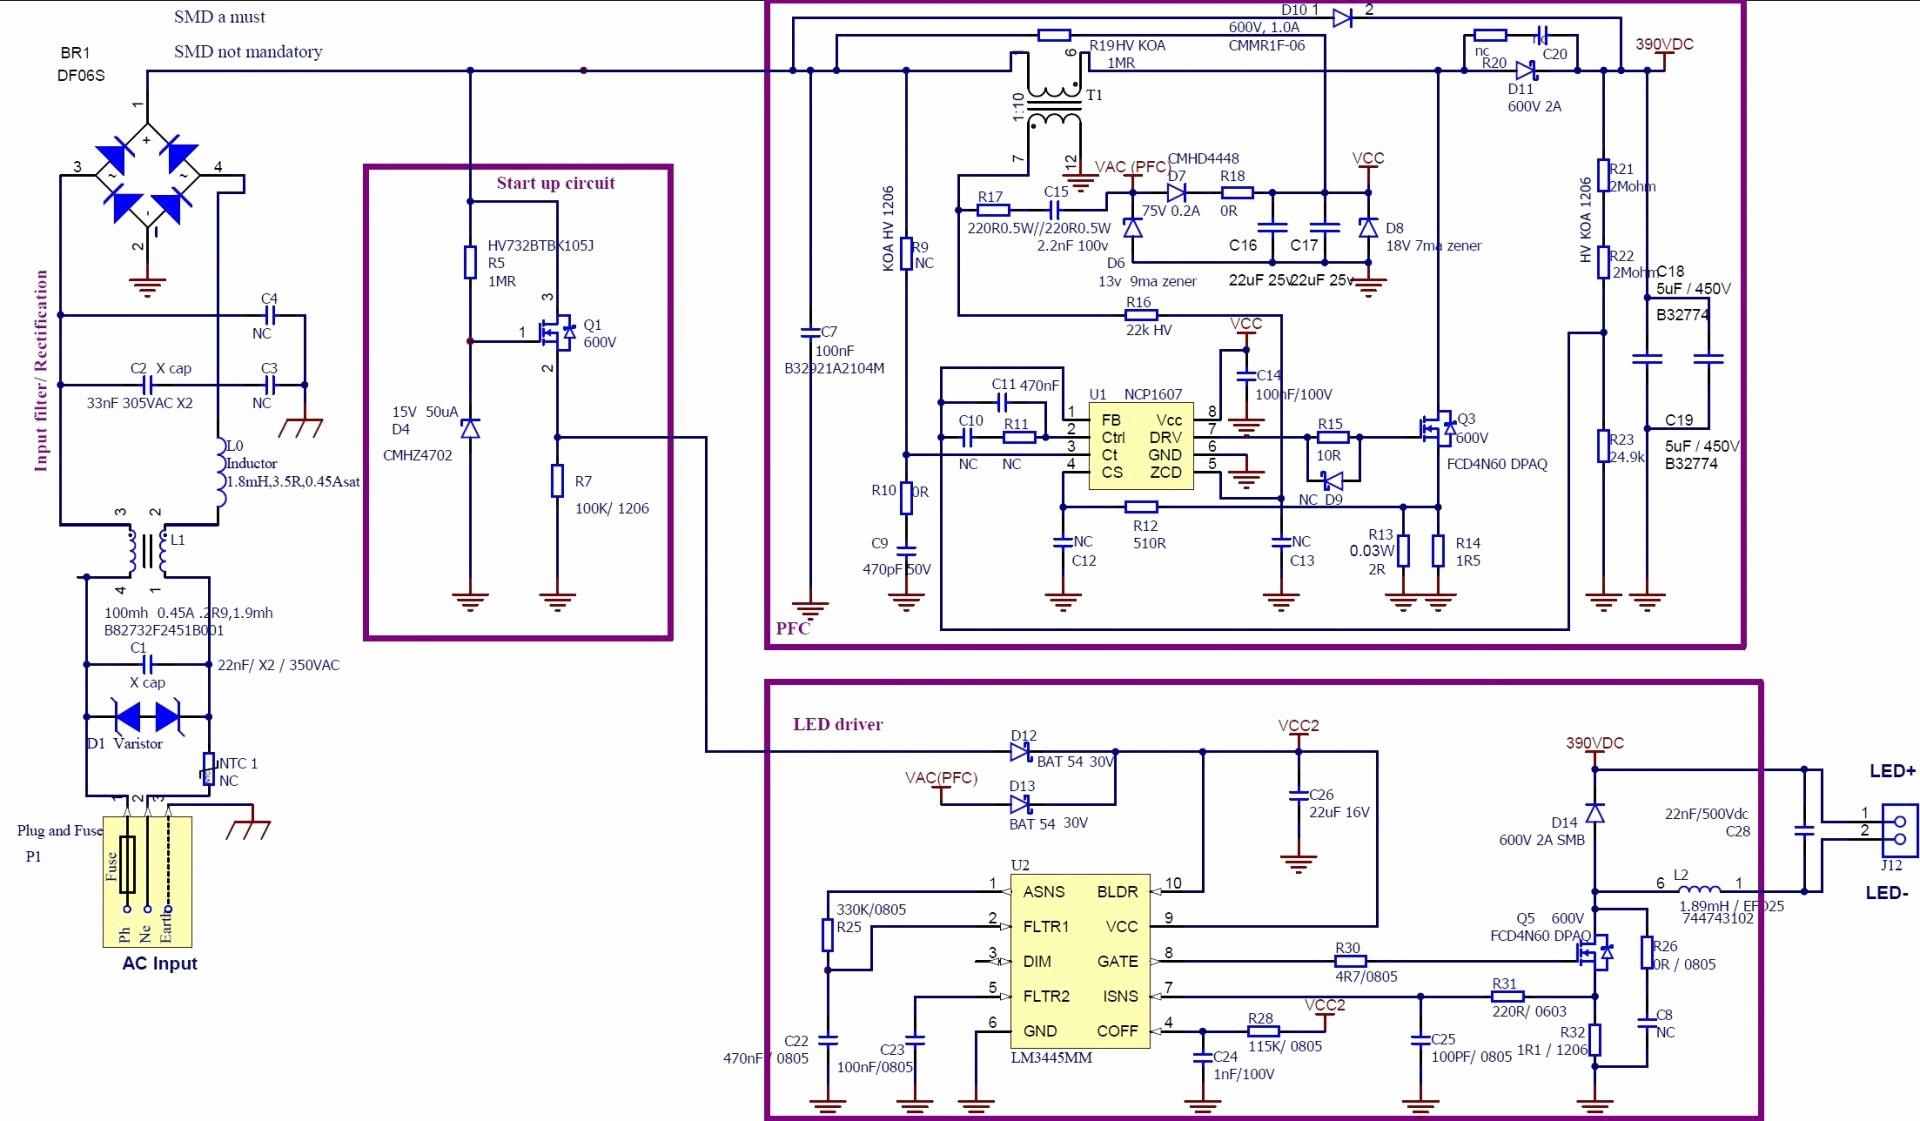 4 Lamp T8 Ballast Wiring Diagram For Tandum | Wiring Diagram Library - 4 Lamp 2 Ballast Wiring Diagram